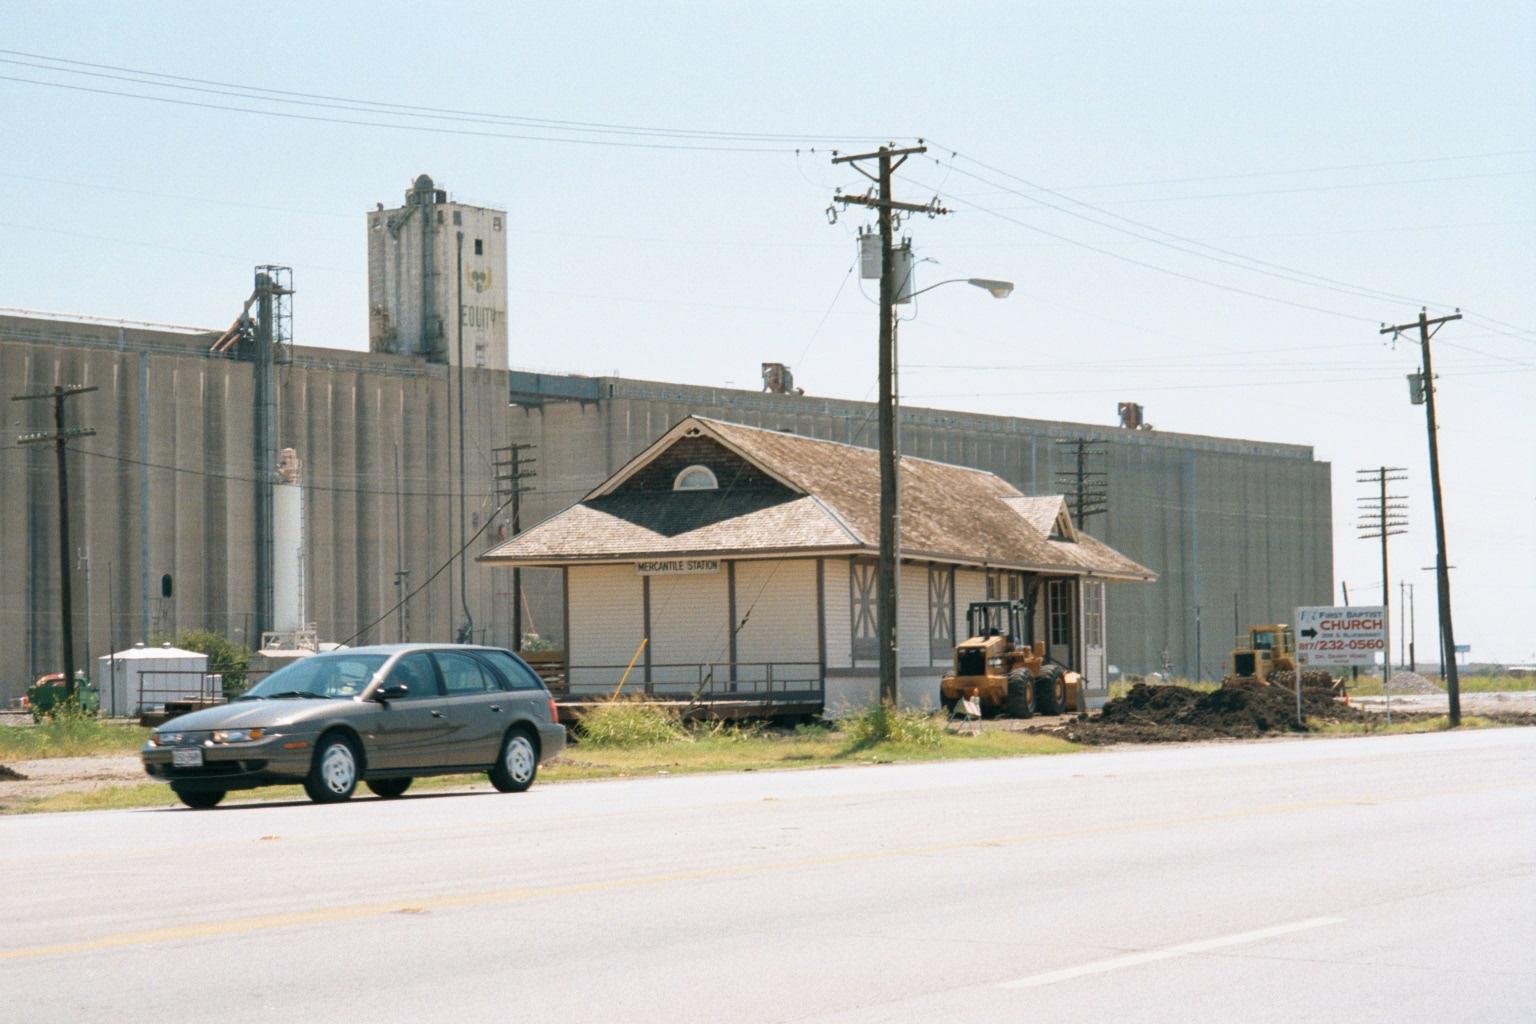 Depot Junction